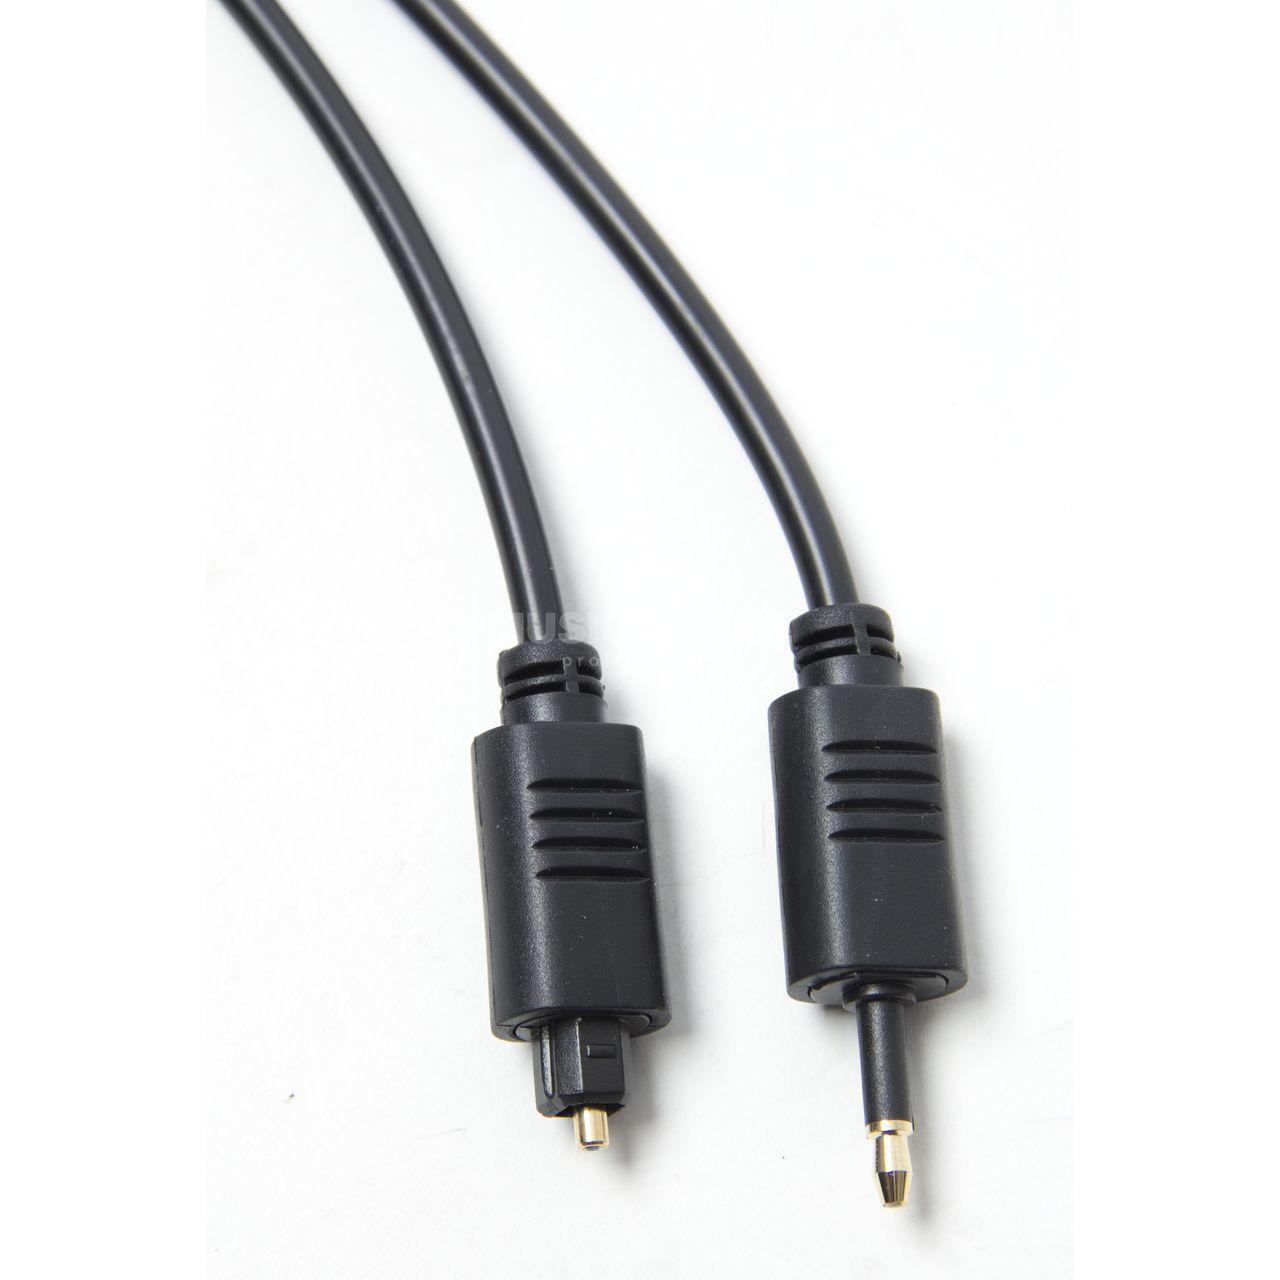 10 metres kenable Optical TOS Cable Digital Audio HQ 4mm Lead GOLD for Soundbar//PS4//Sky 10m